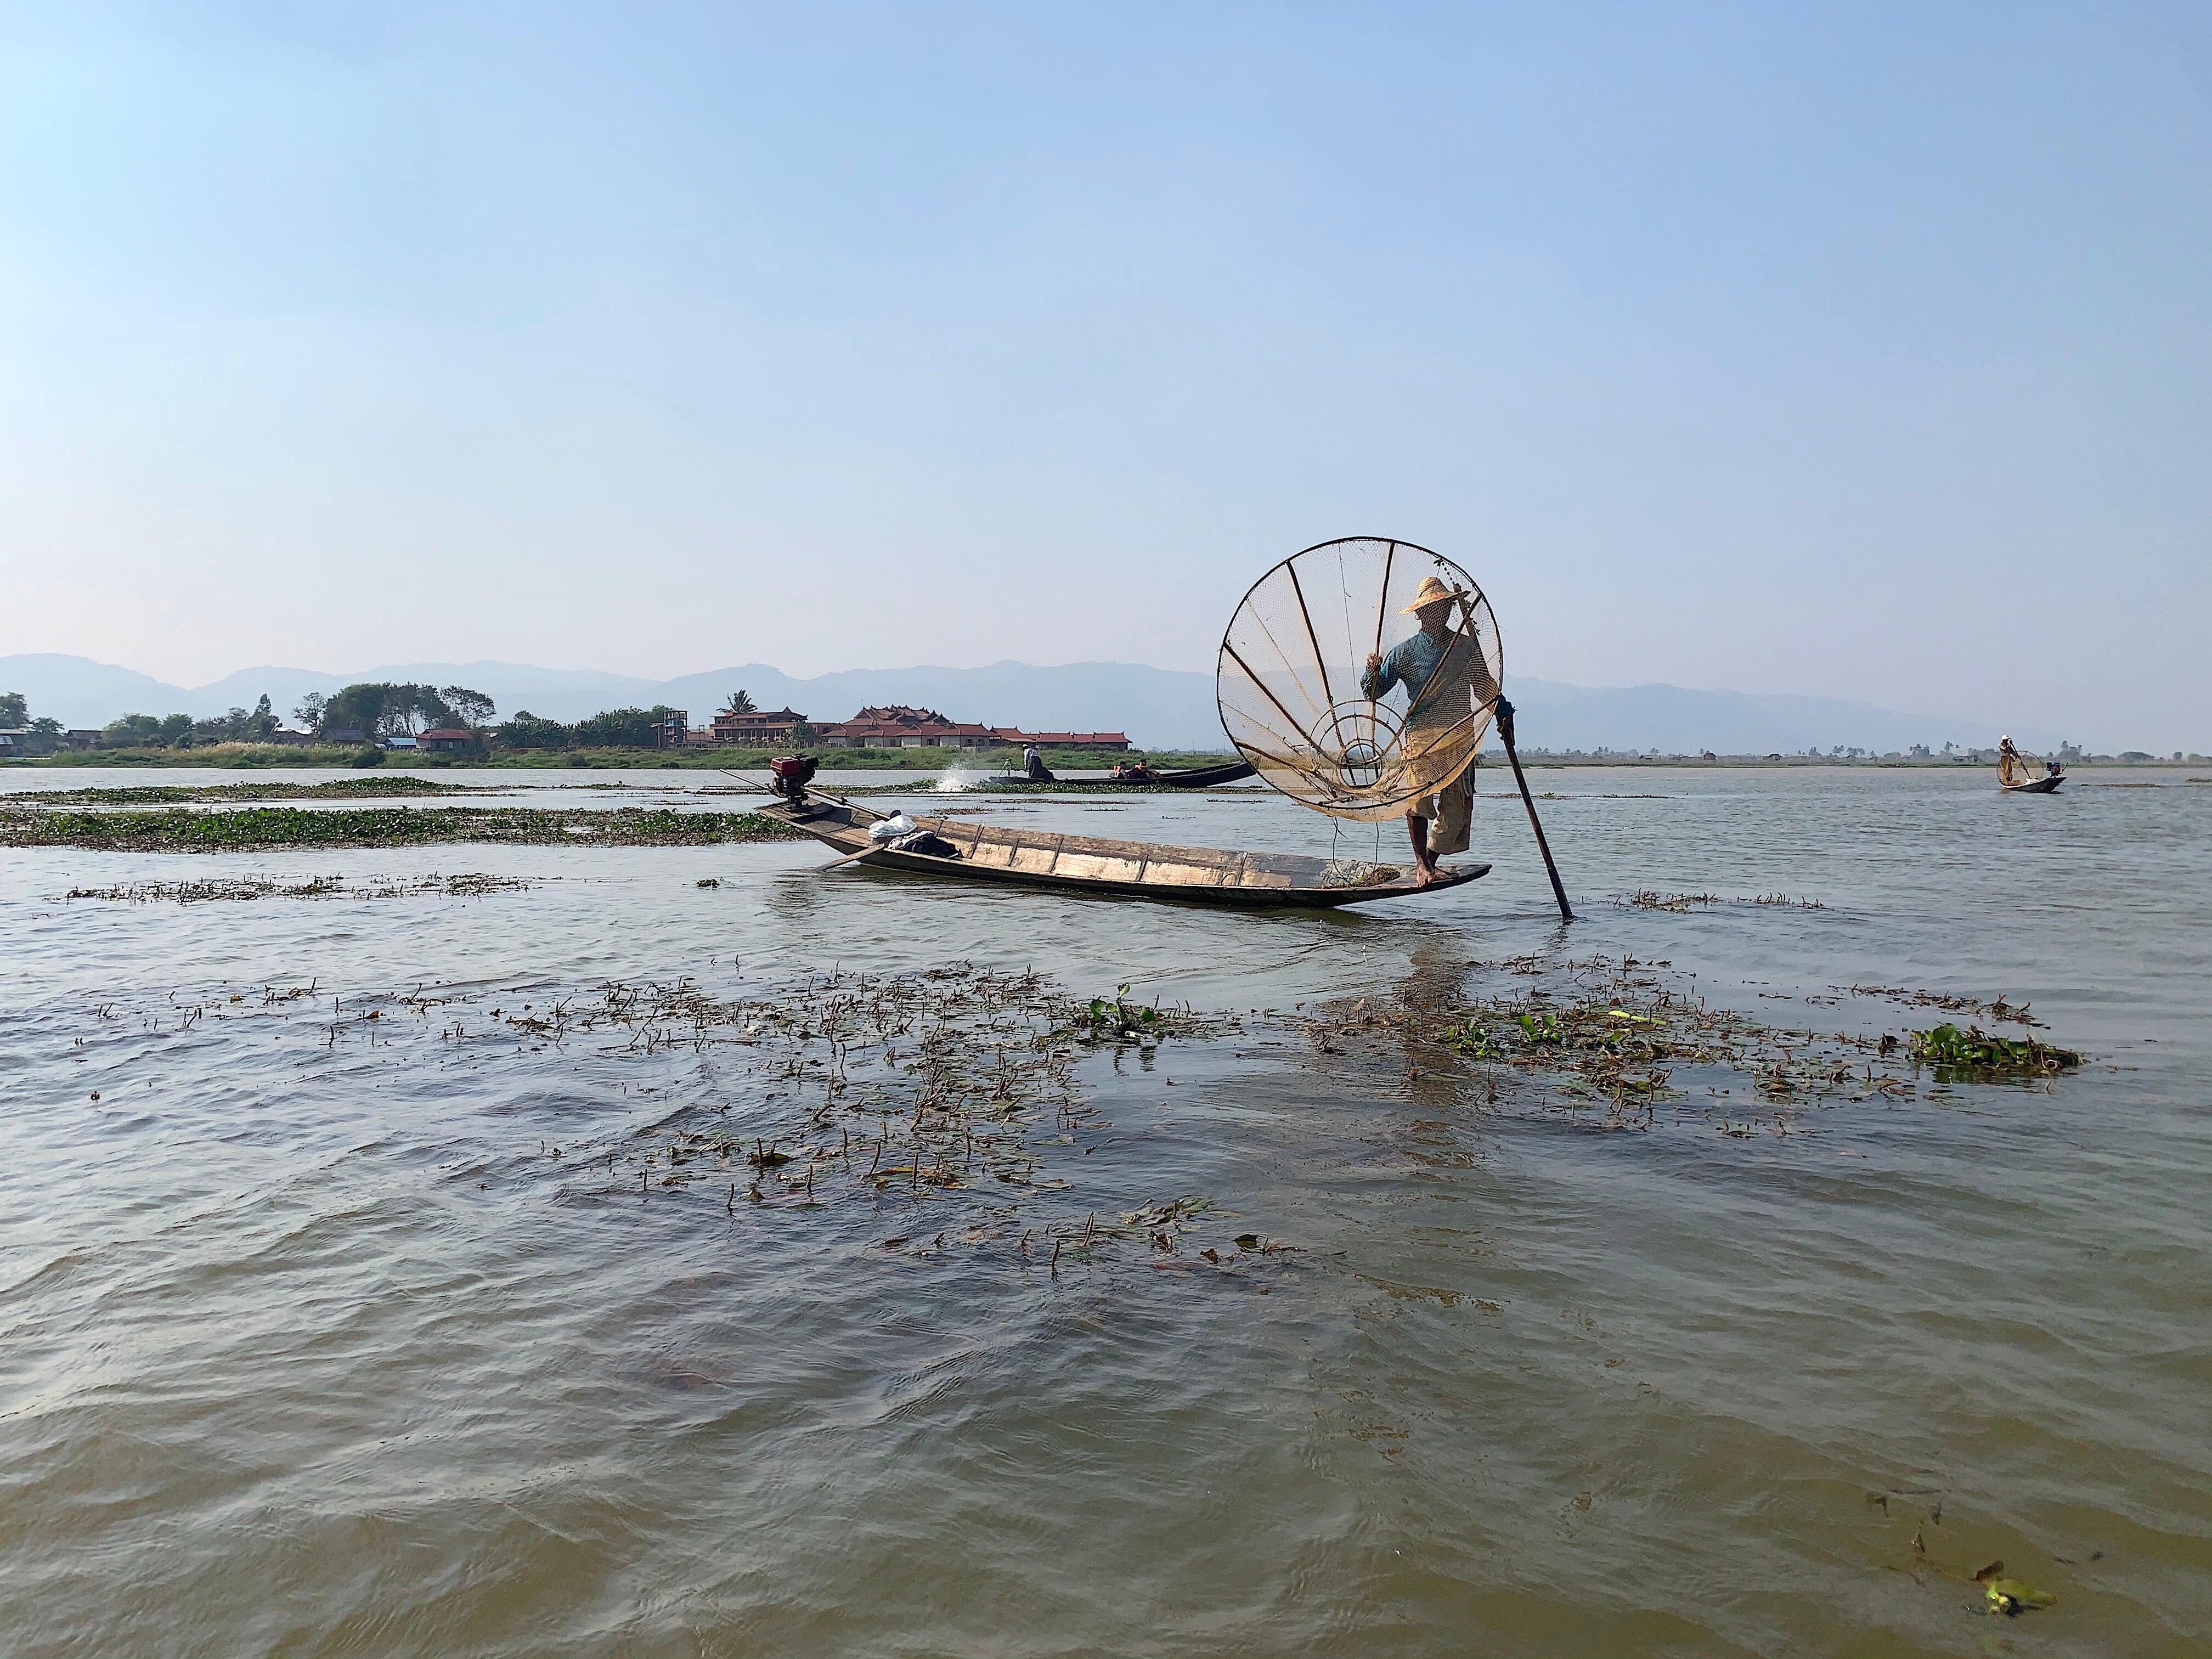 Fischer am Inle-See in Myanmar